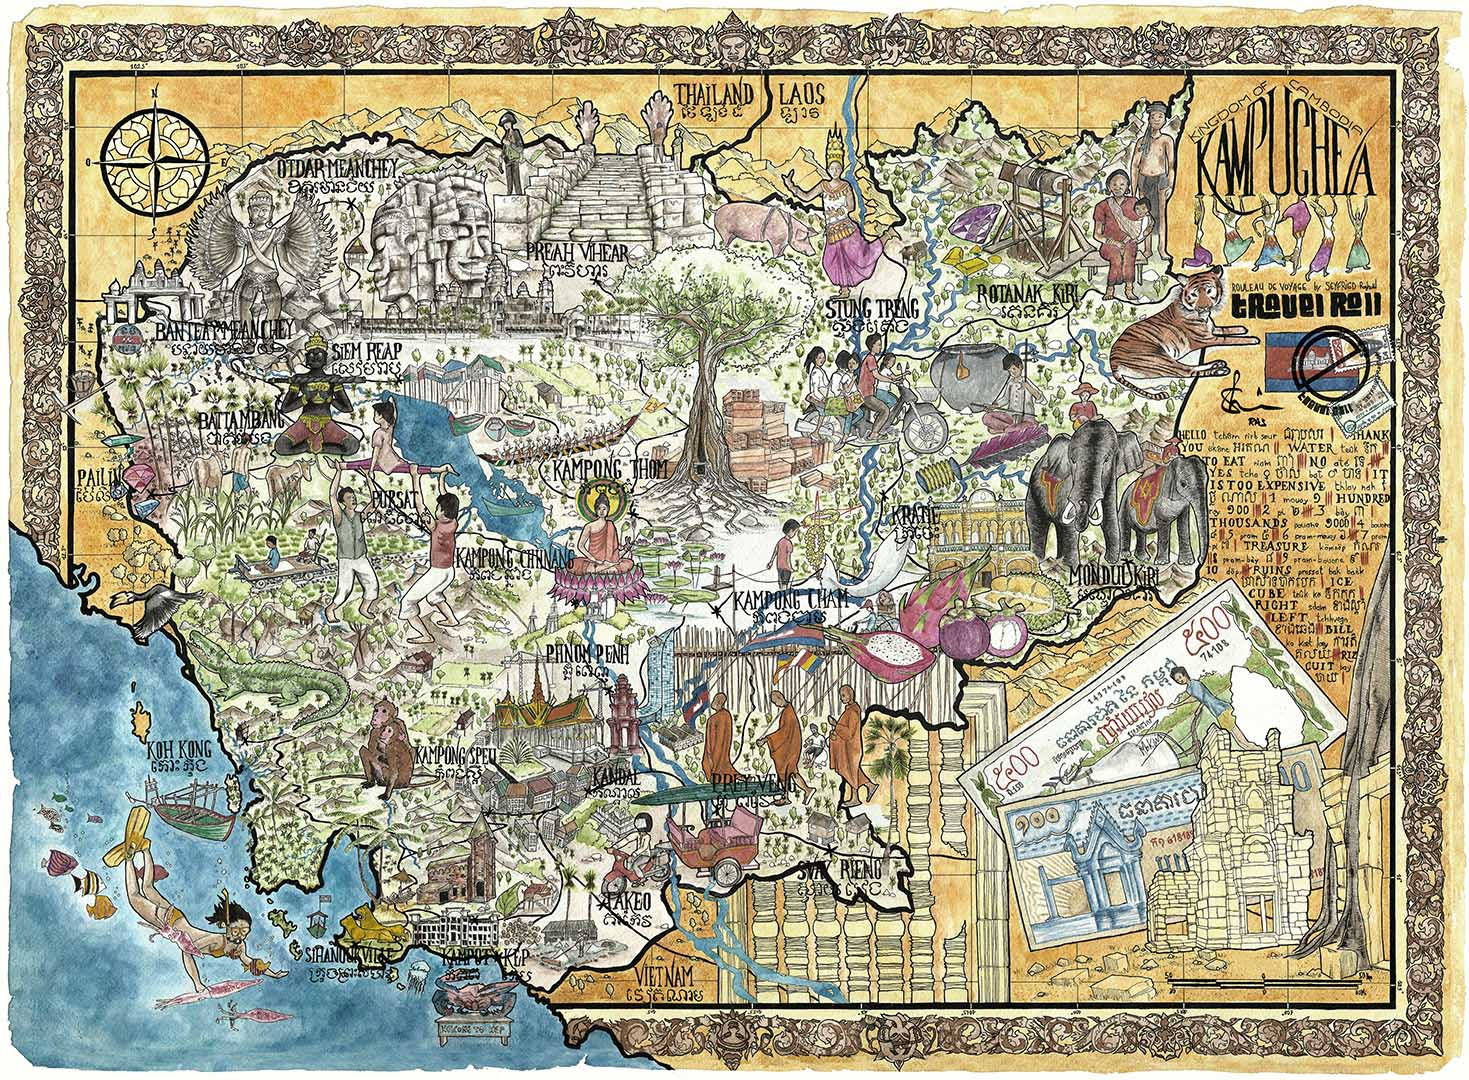 travel-roll-cambodia-diary-souvenir-gift-map-1080